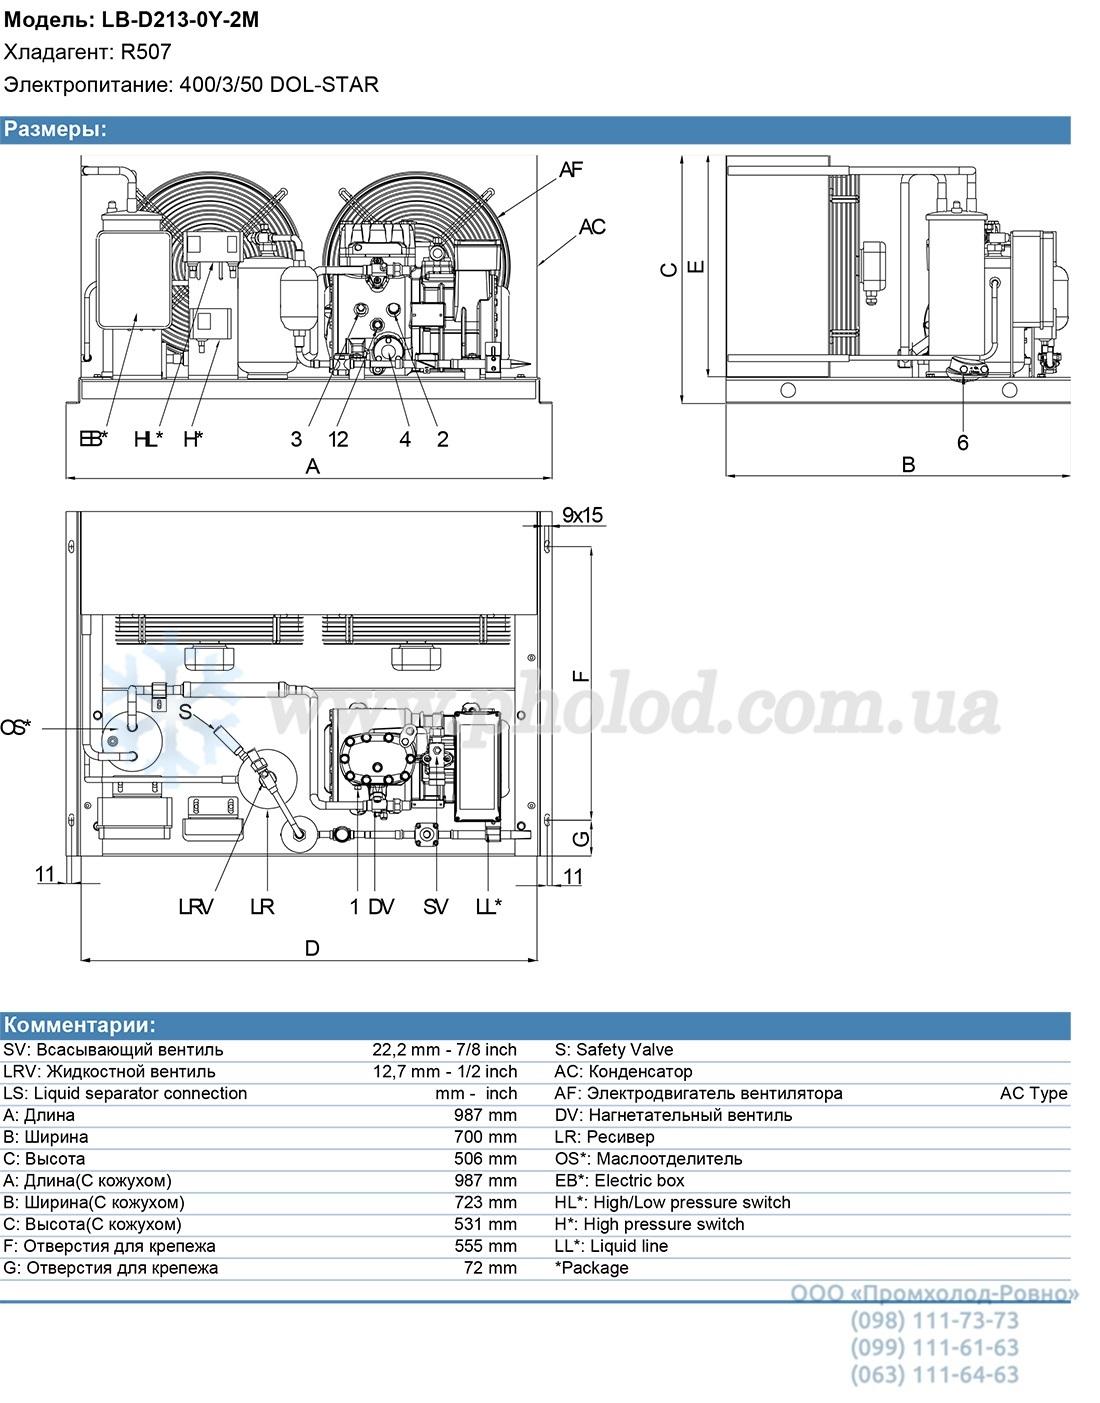 LB-D213-0Y-2M 3